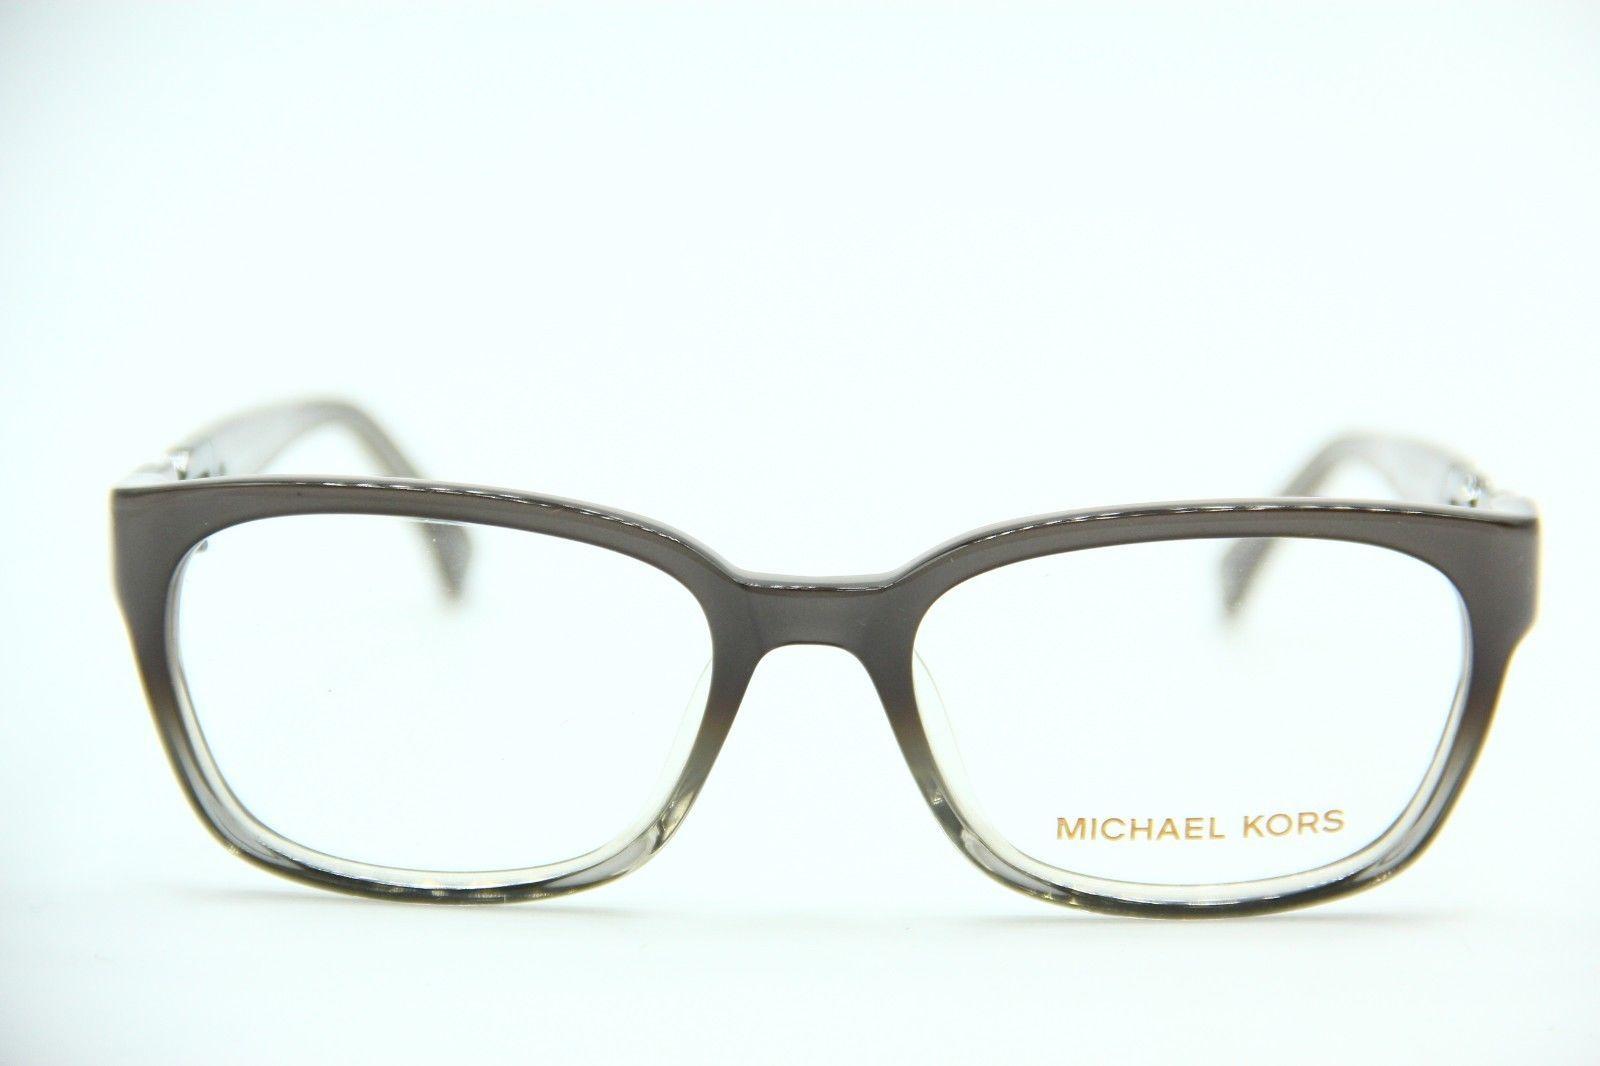 NEW MICHAEL KORS MK 869 039 GREIGE EYEGLASSES AUTHENTIC RX MK869 51-17